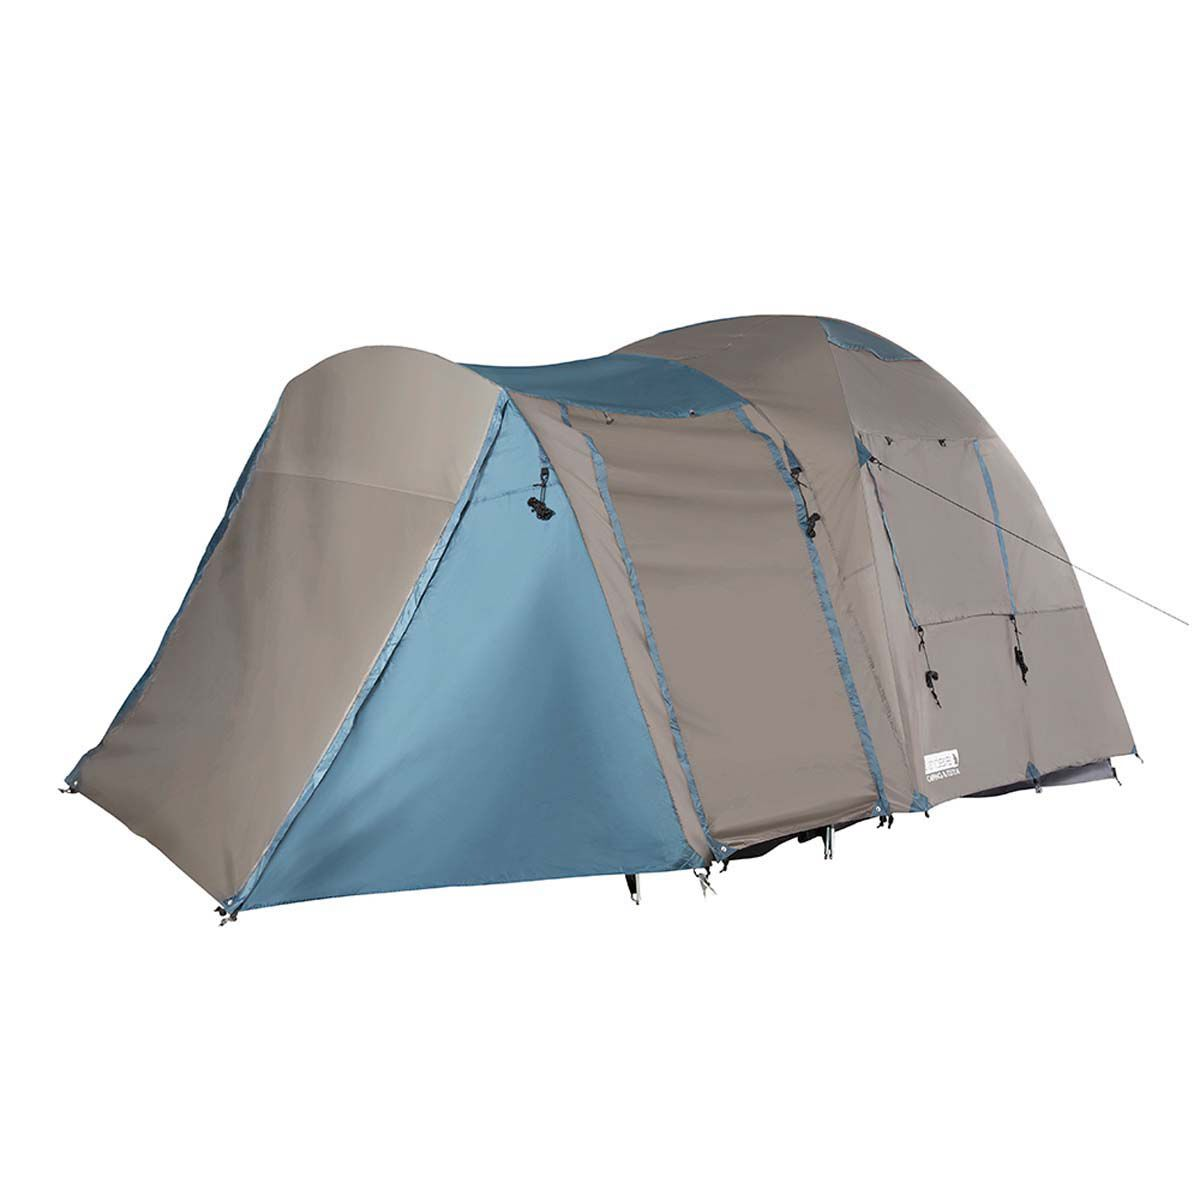 ... Magnitude 4V Plus Dome Tent 6 Person  bcf_hi-res  sc 1 st  BCF & Dome Tents - Buy Online - BCF Australia